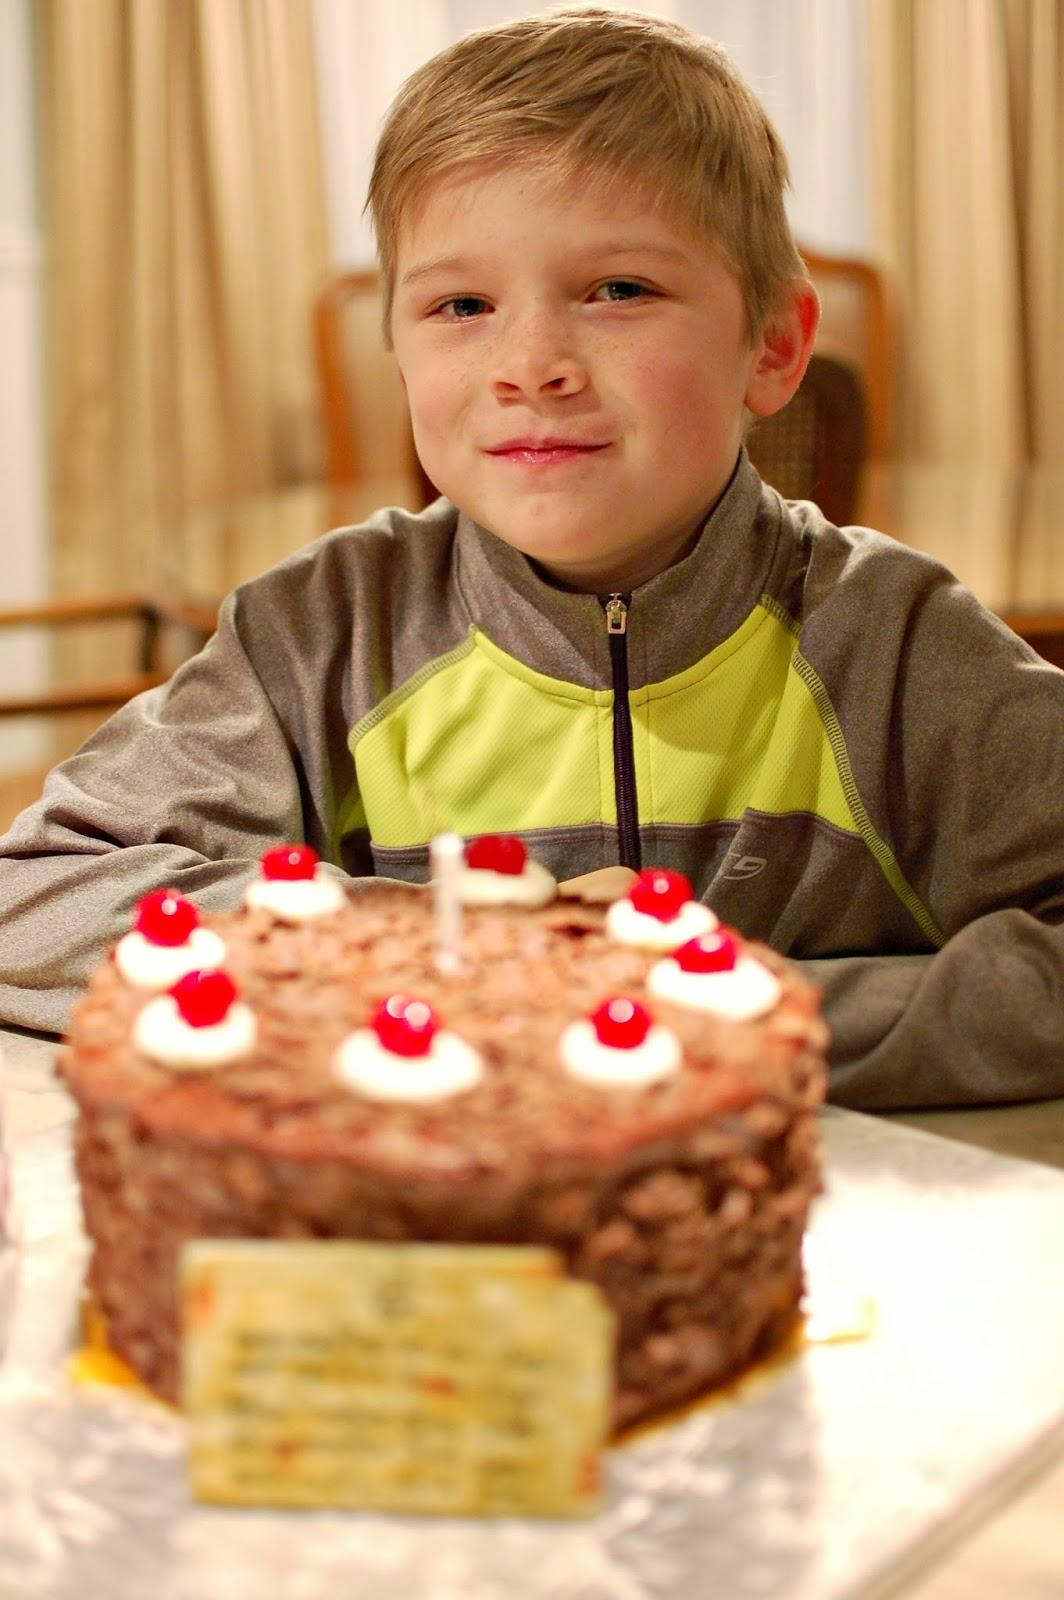 CAKE HAPPENS: Portal Cake...and a photo shoot. :)